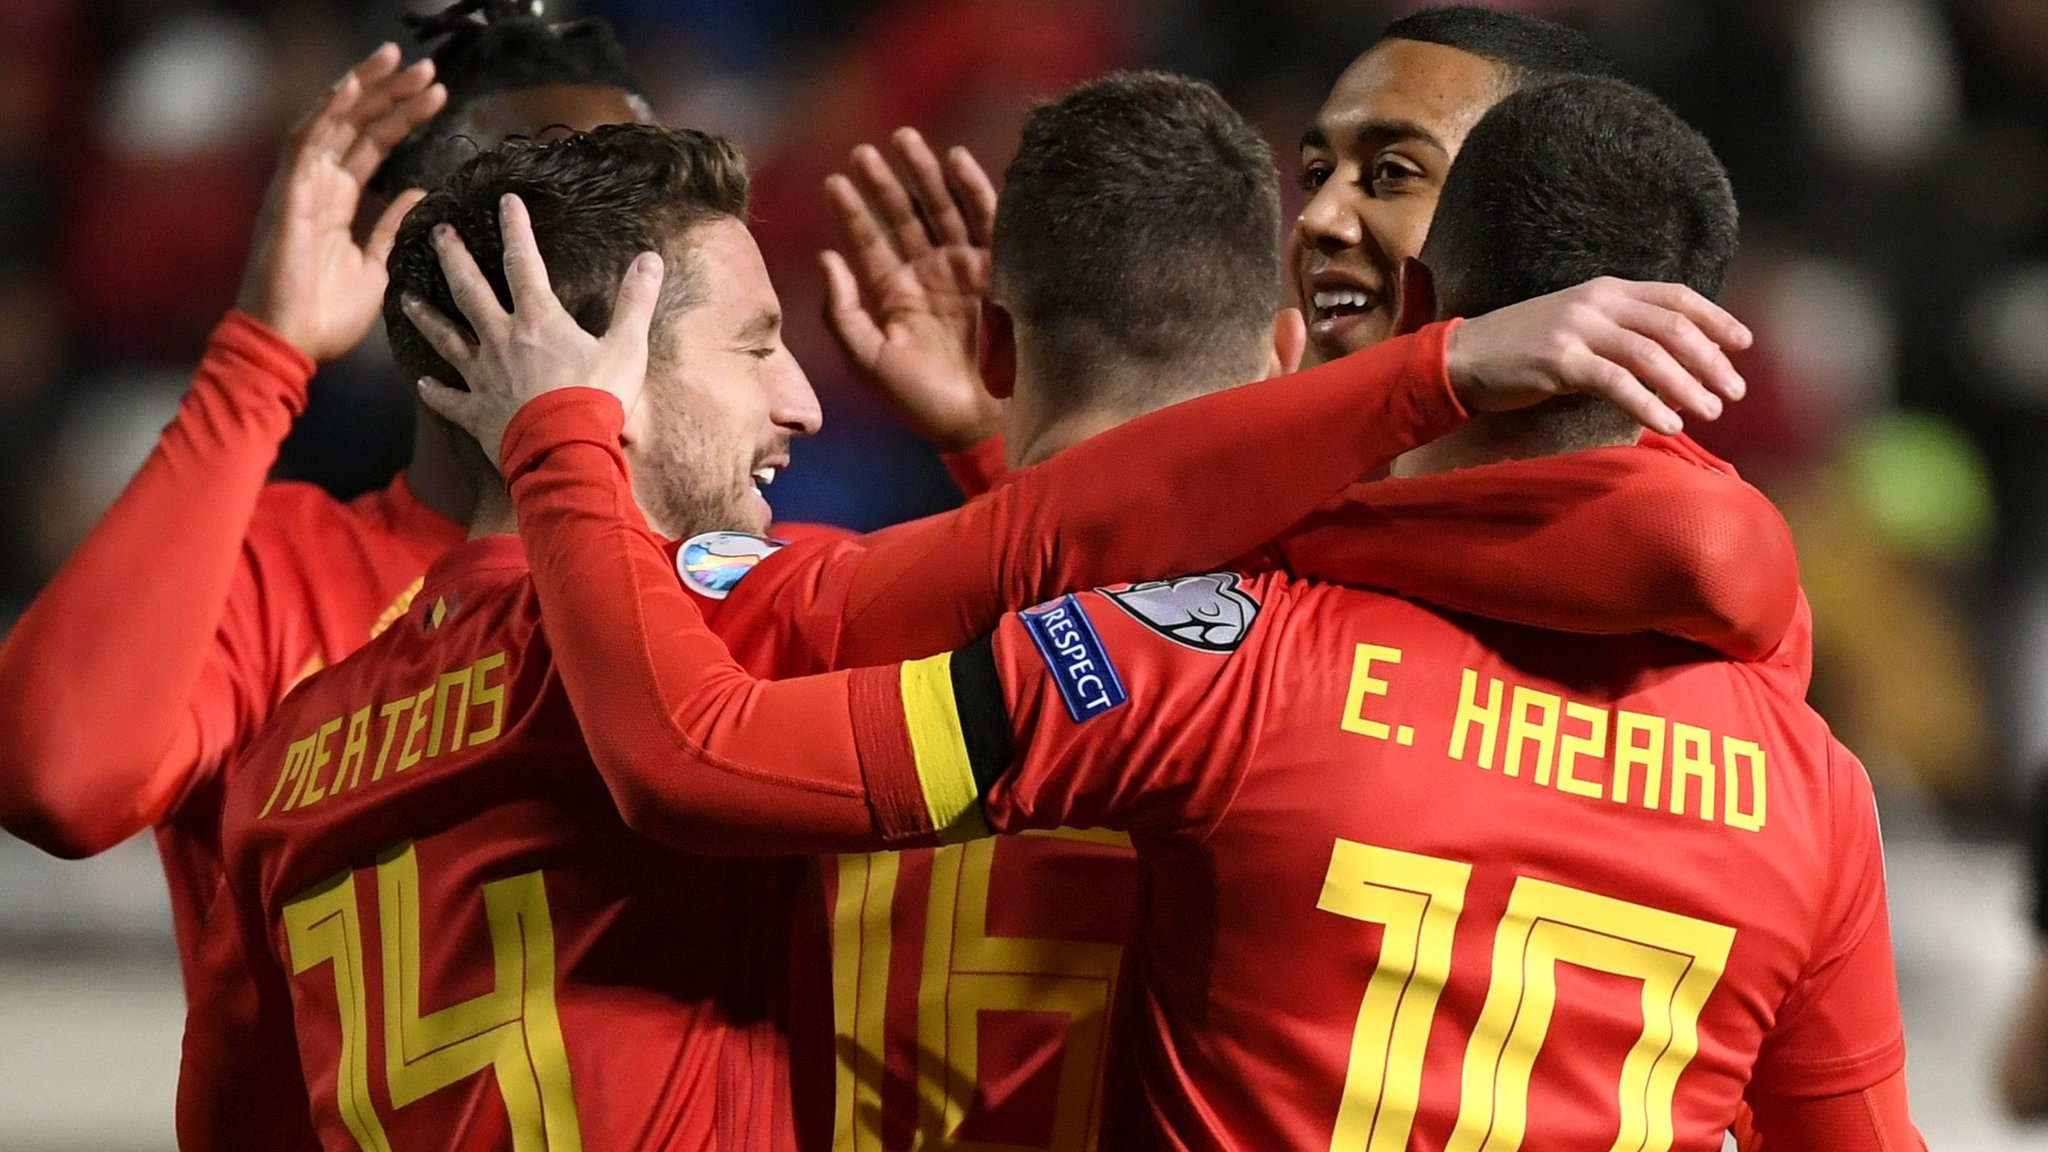 Cyprus 0-2 Belgium: Eden Hazard scores again as Red Devils top Euro qualifying group